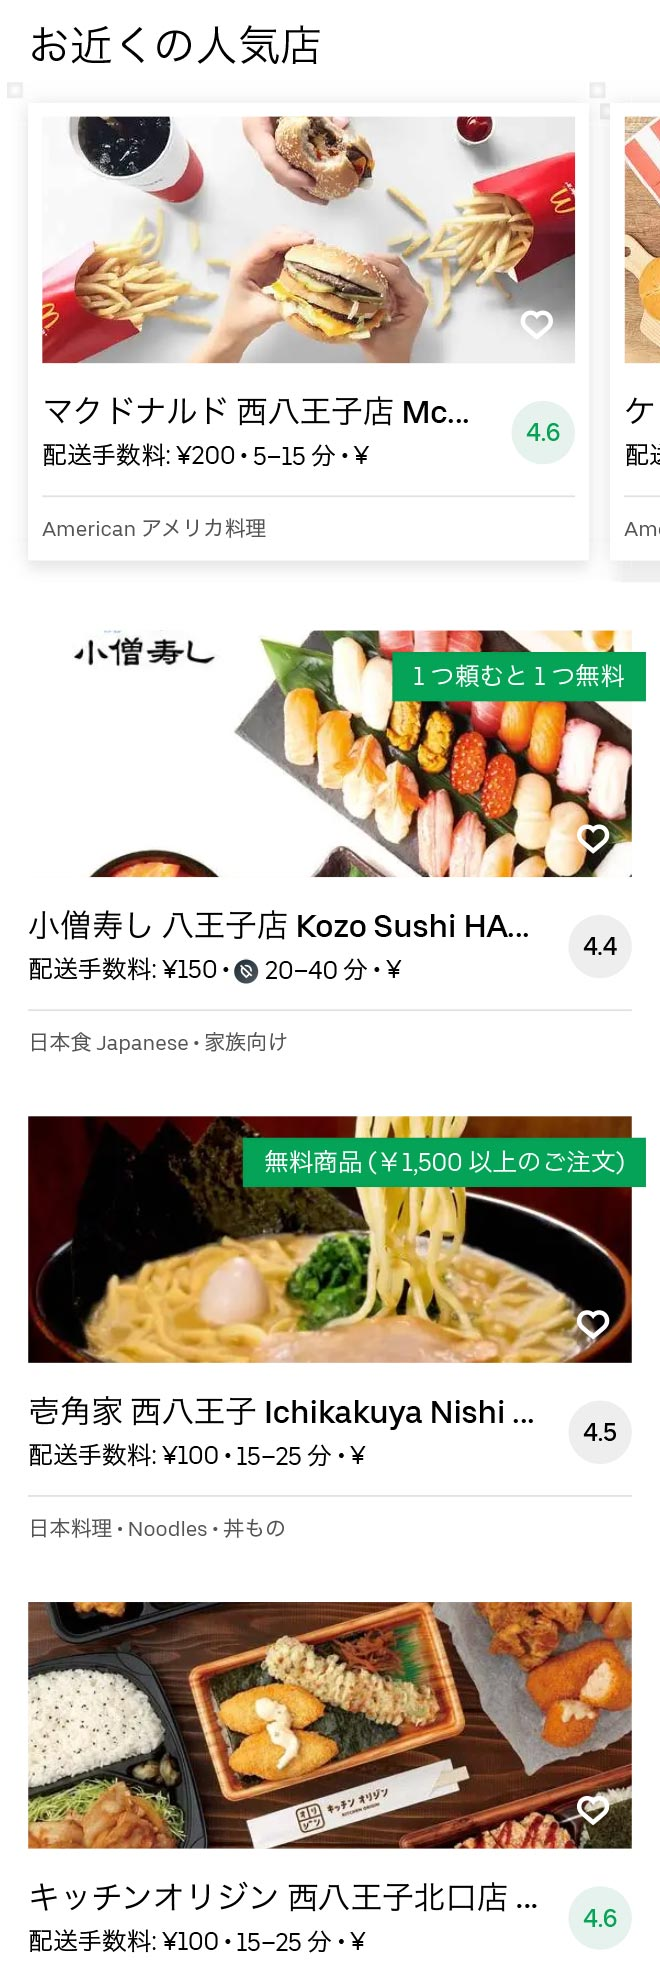 Nishi hatioji menu 2010 01